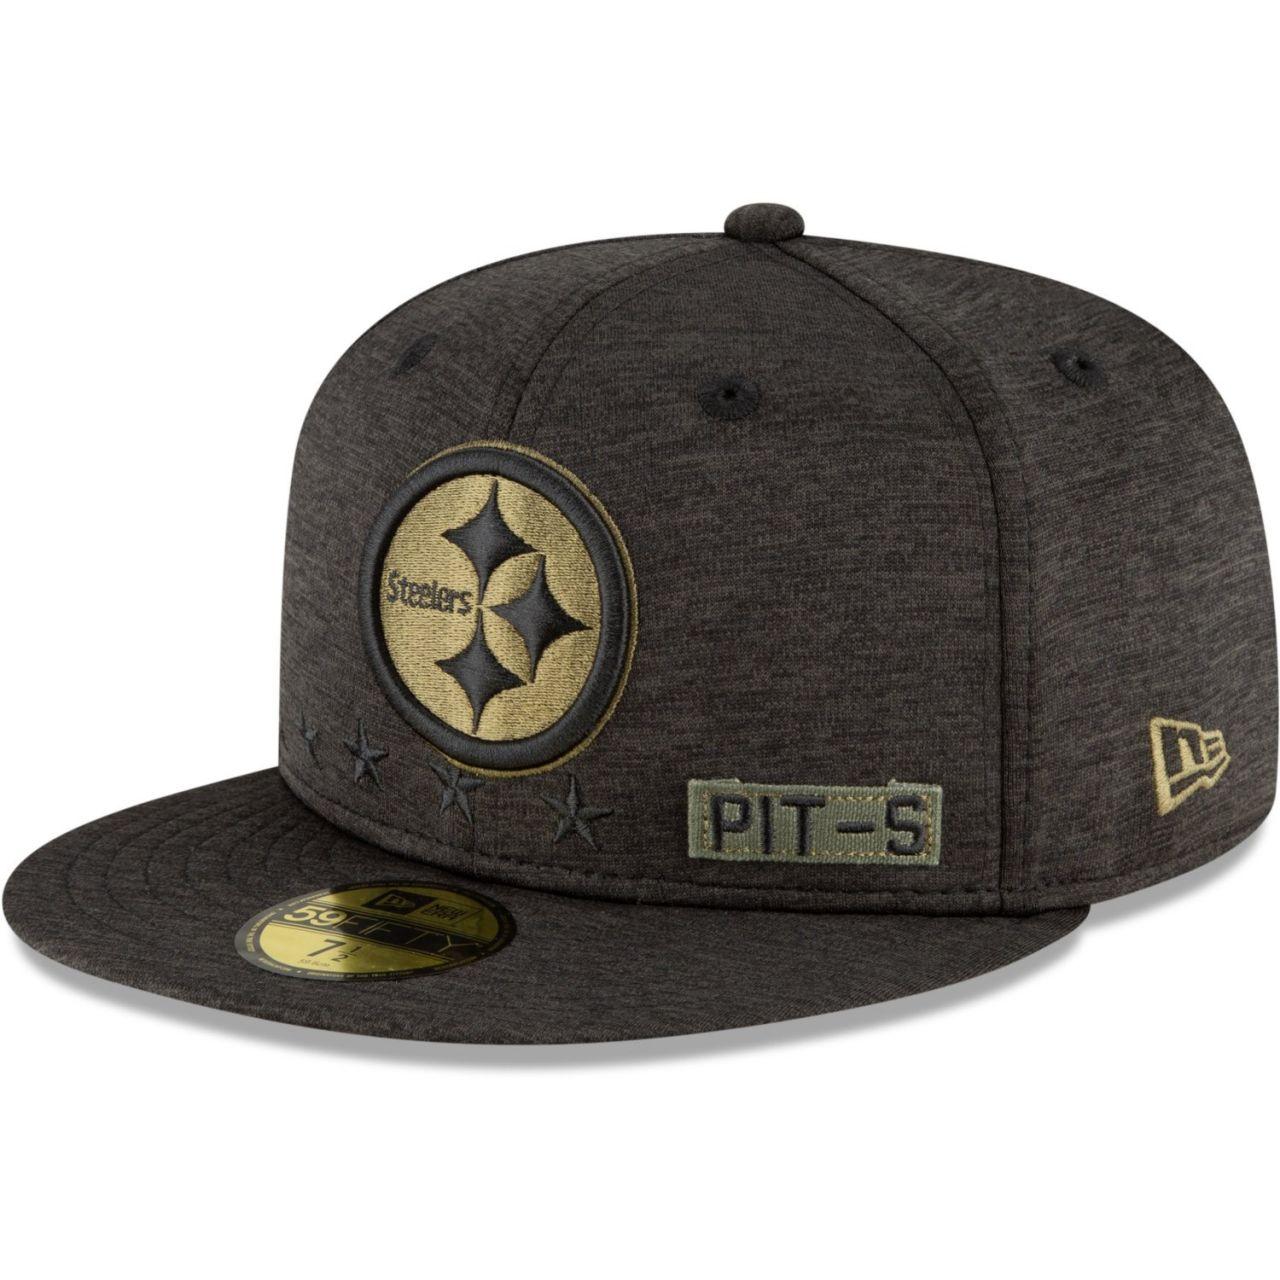 amfoo - New Era 59FIFTY Cap Salute to Service Pittsburgh Steelers